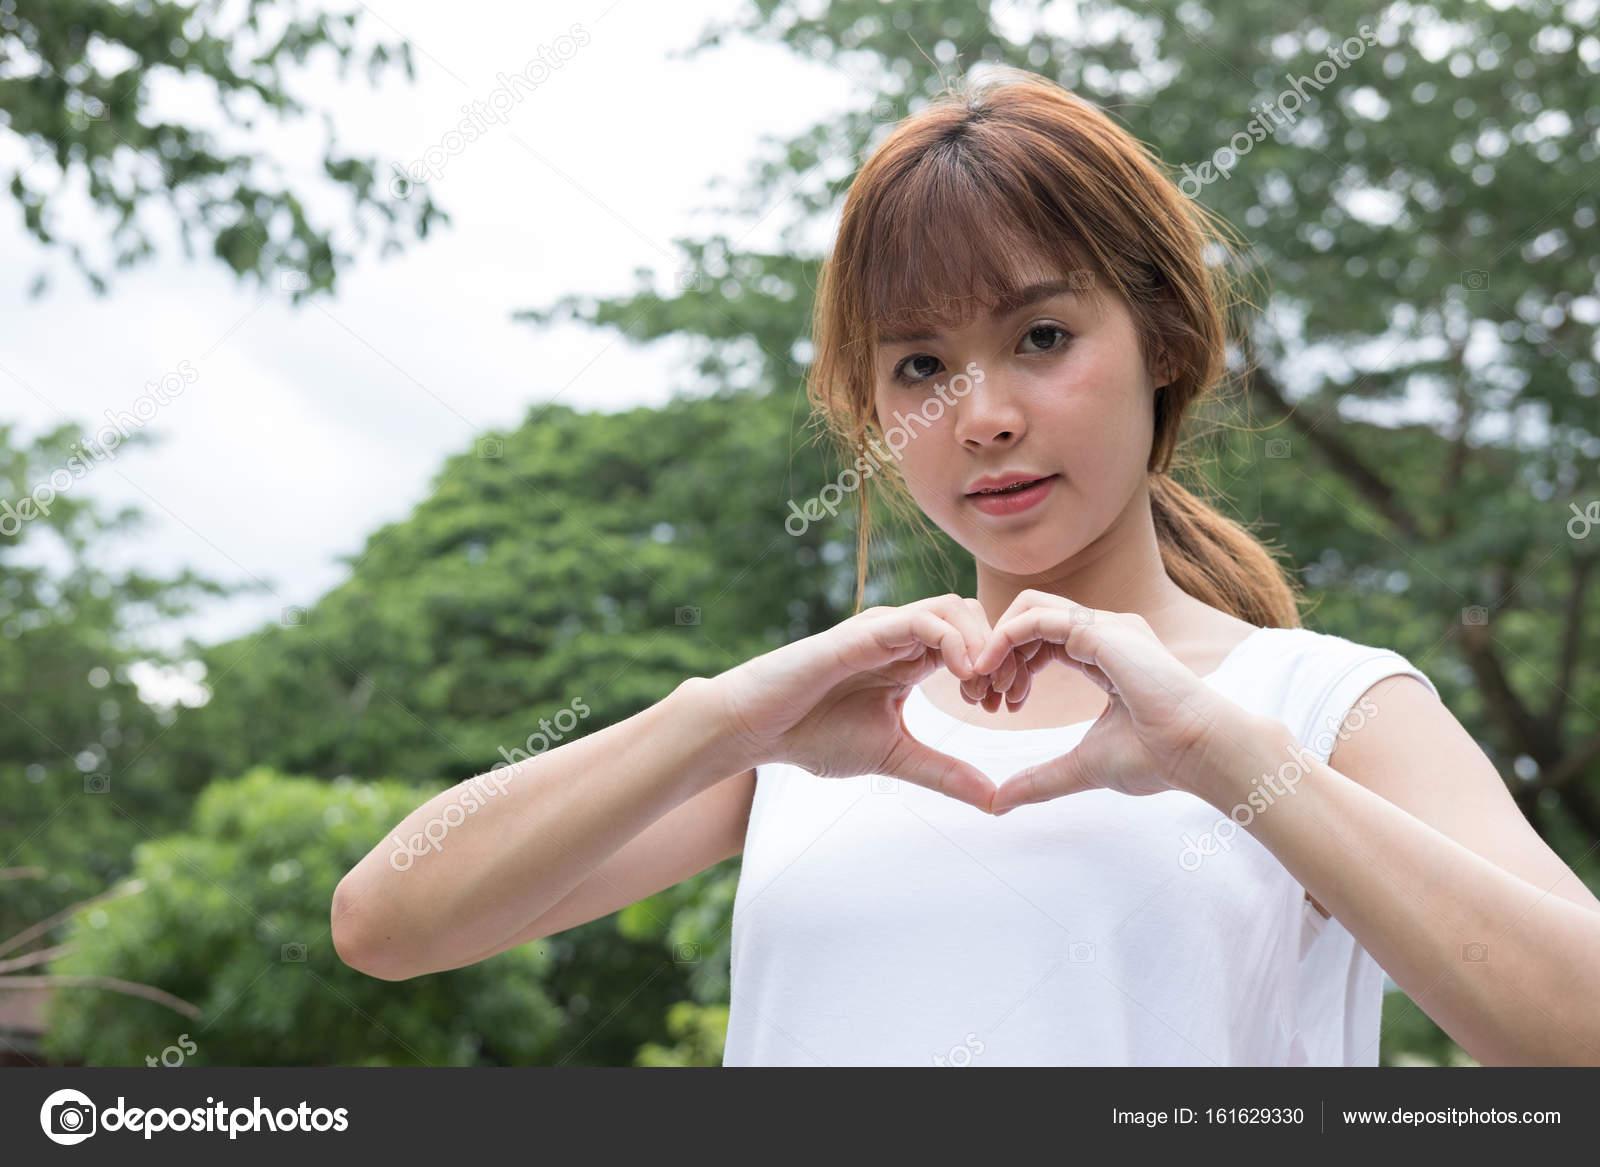 Videos of asian women touching dicks in public